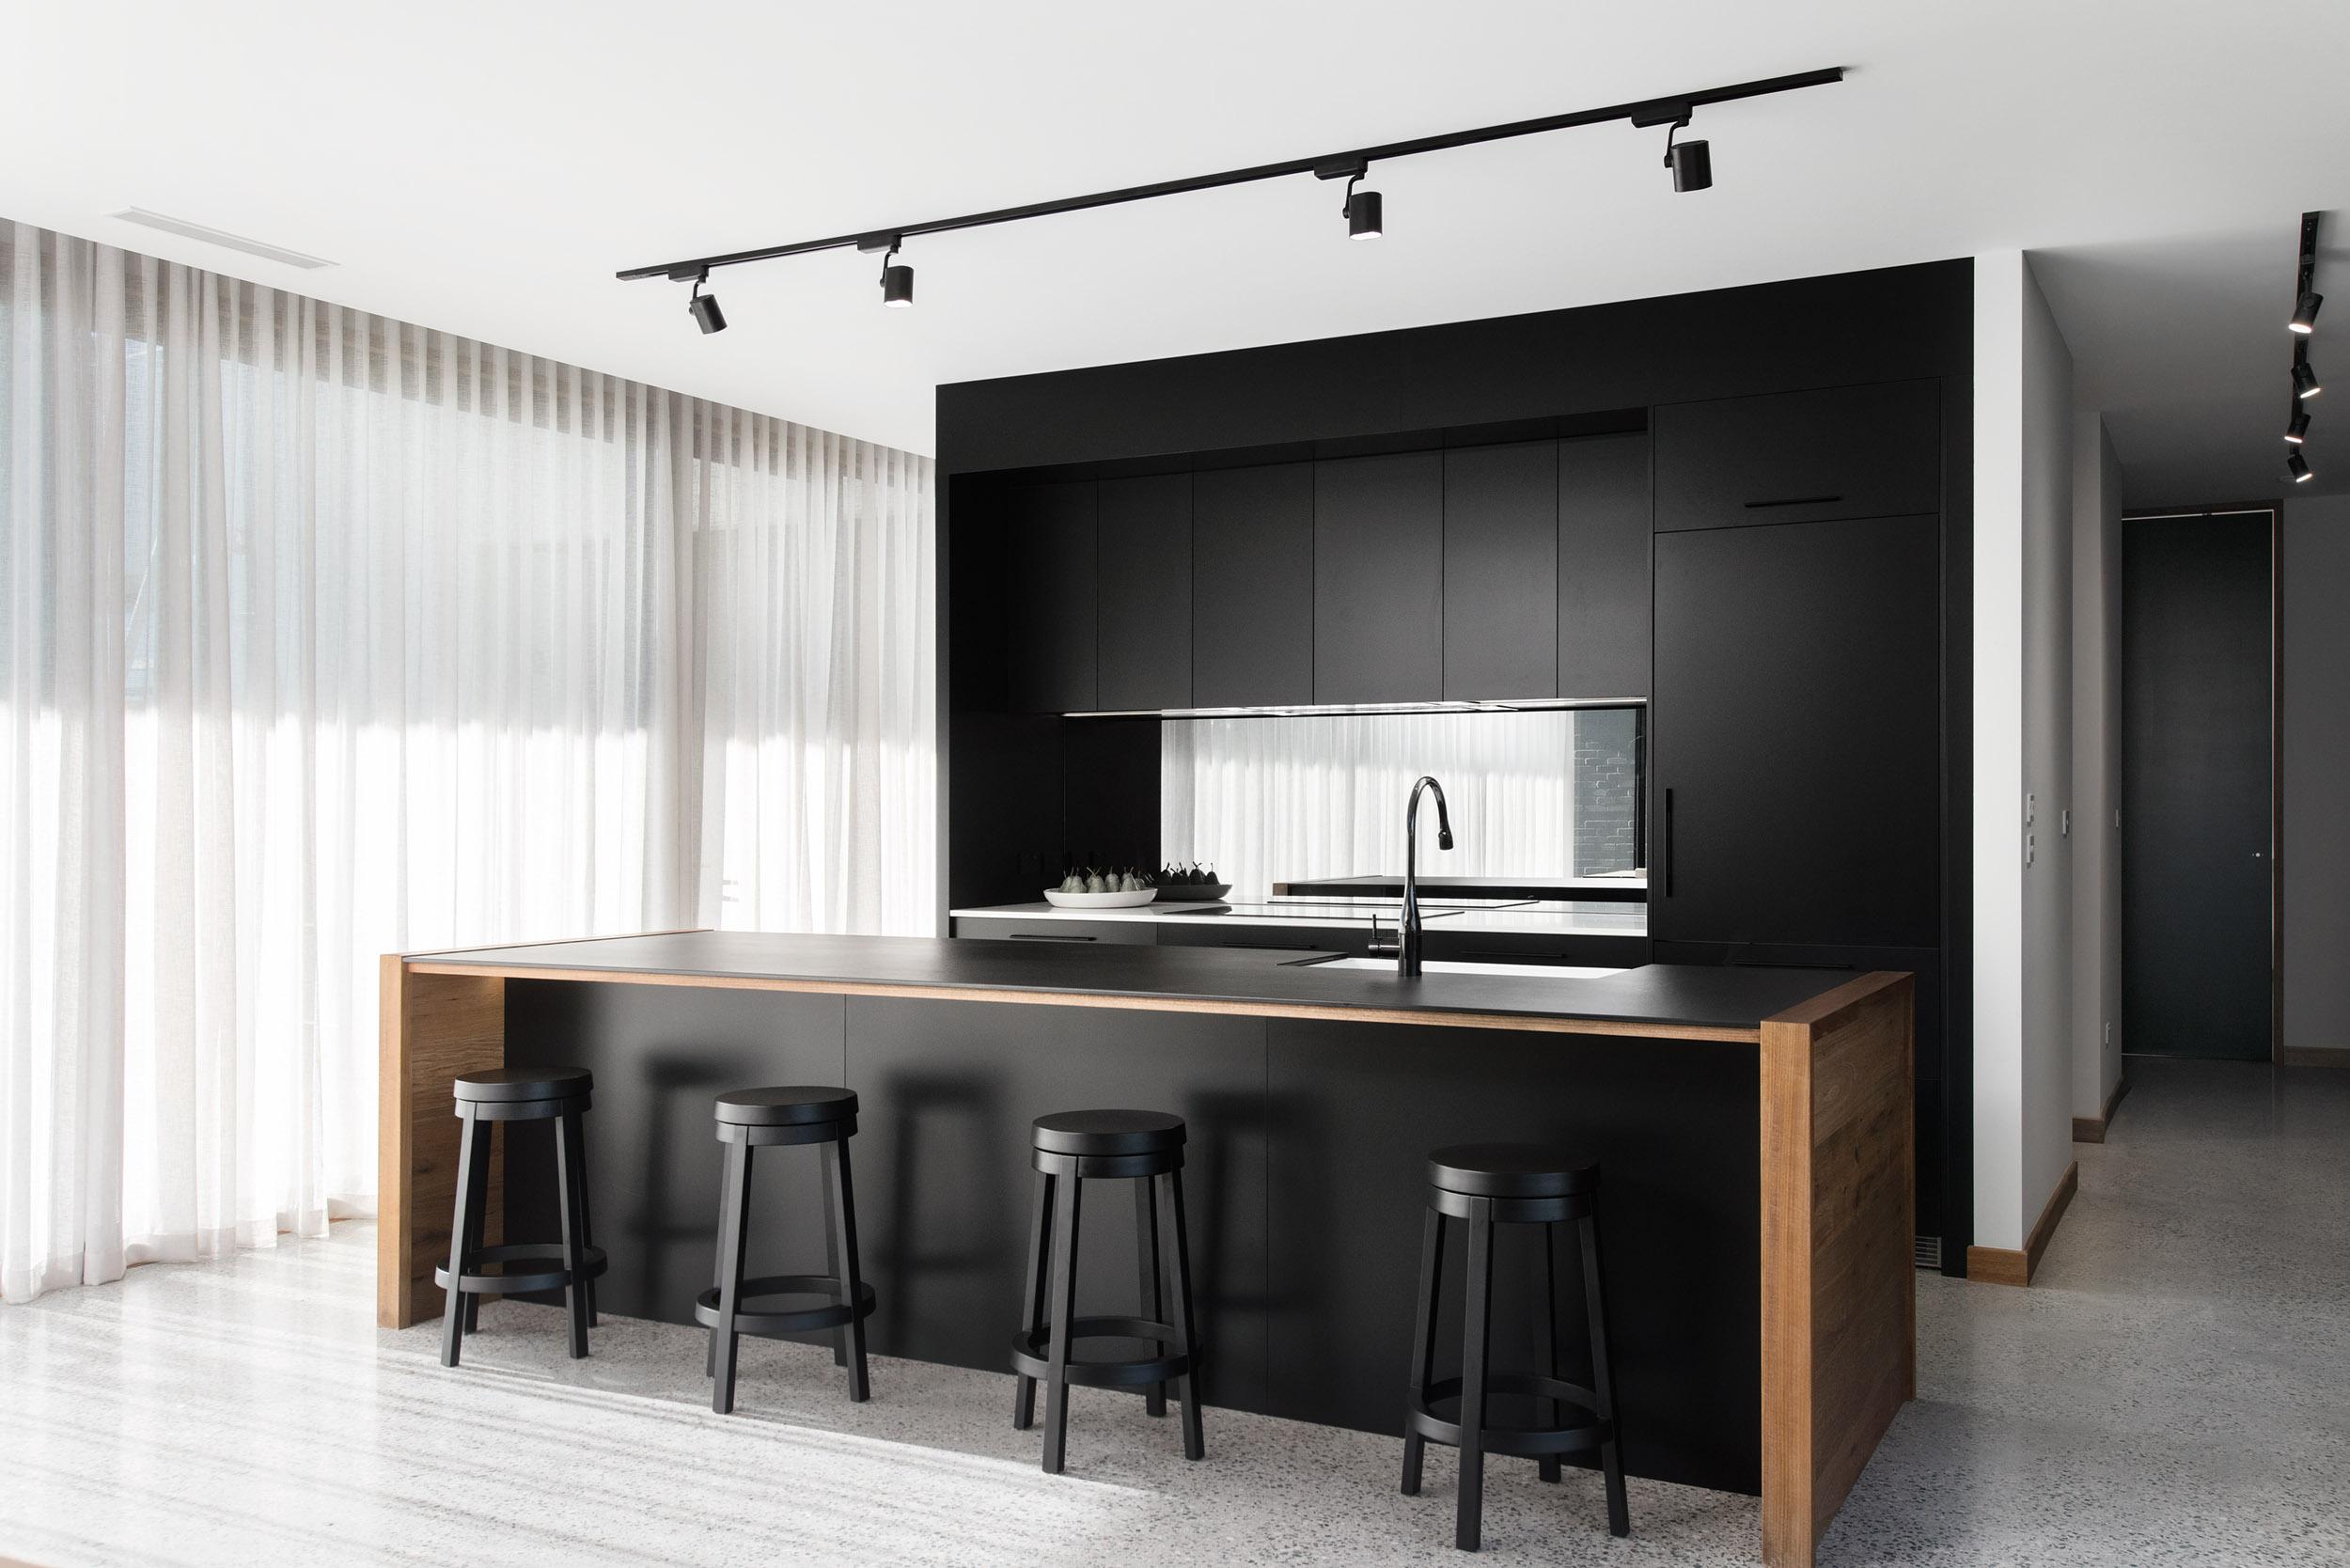 Ivy Lane House - 2018 HIA-CSR Australian 'Kitchen of the Year' 2017 HIA 'Kitchen of the Year' 2017 HIA 'Kitchen Design of the Year'